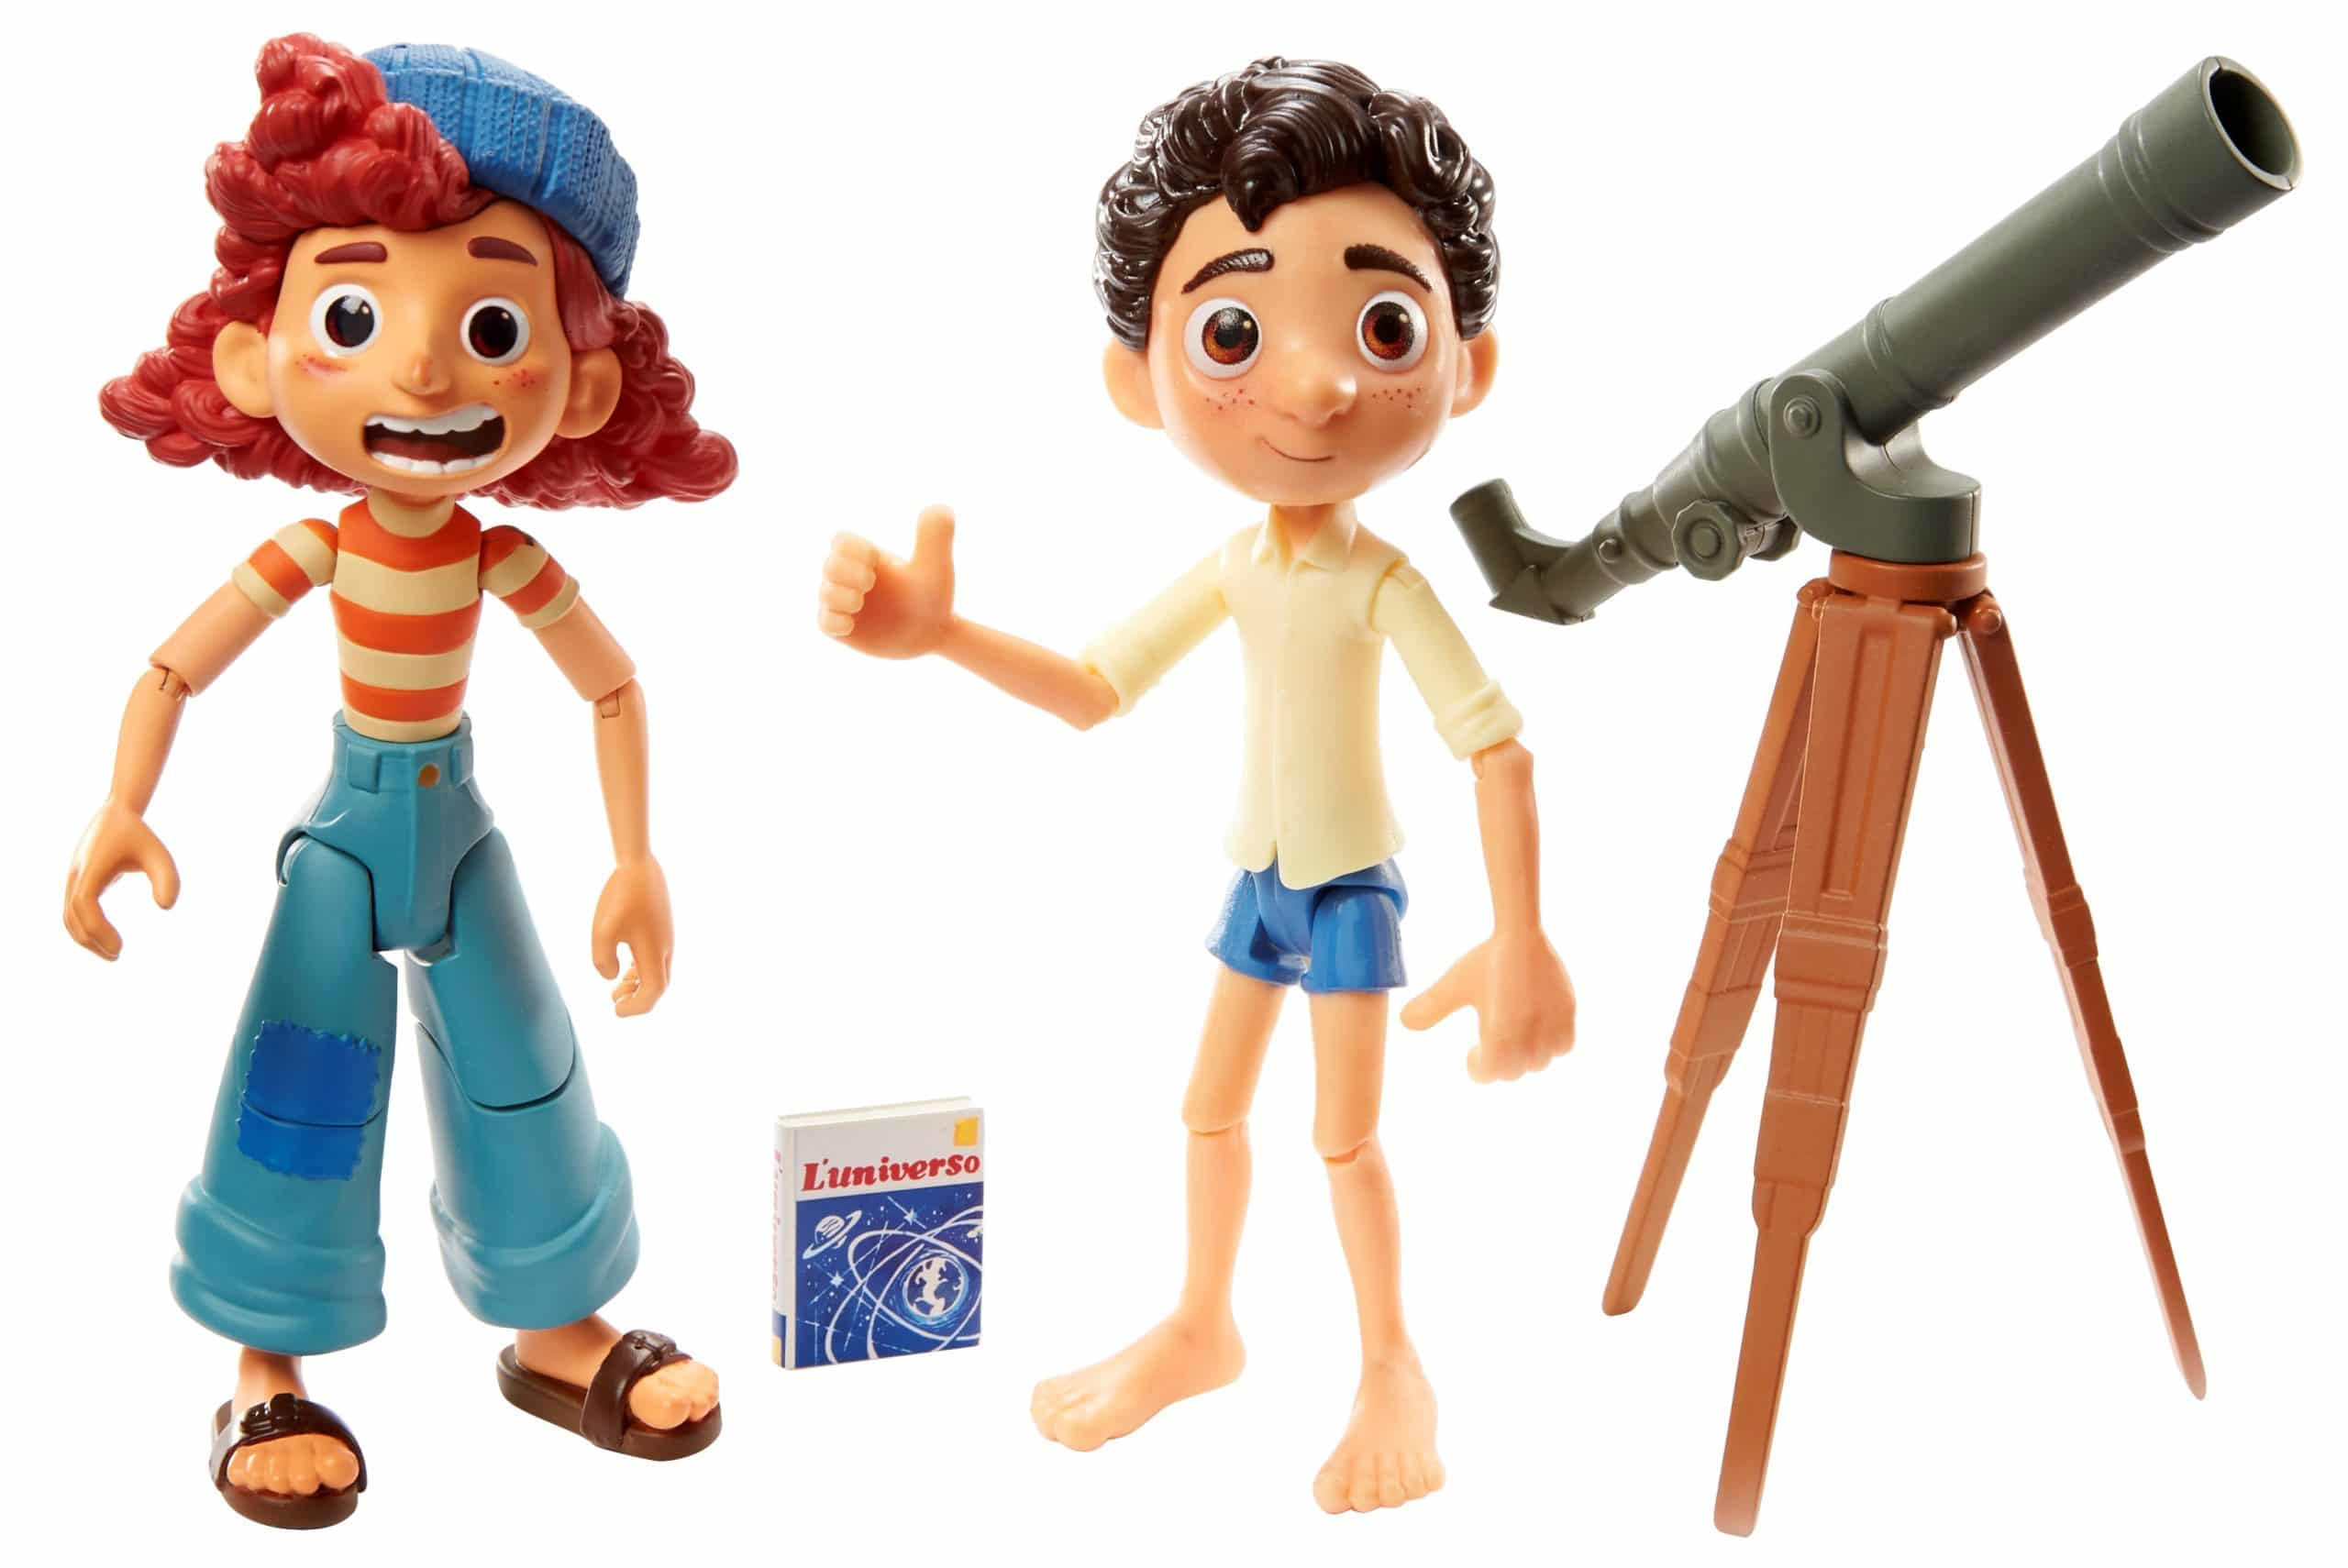 Mattel unveils Luca action figures ahead of the film's Disney+ premiere 18